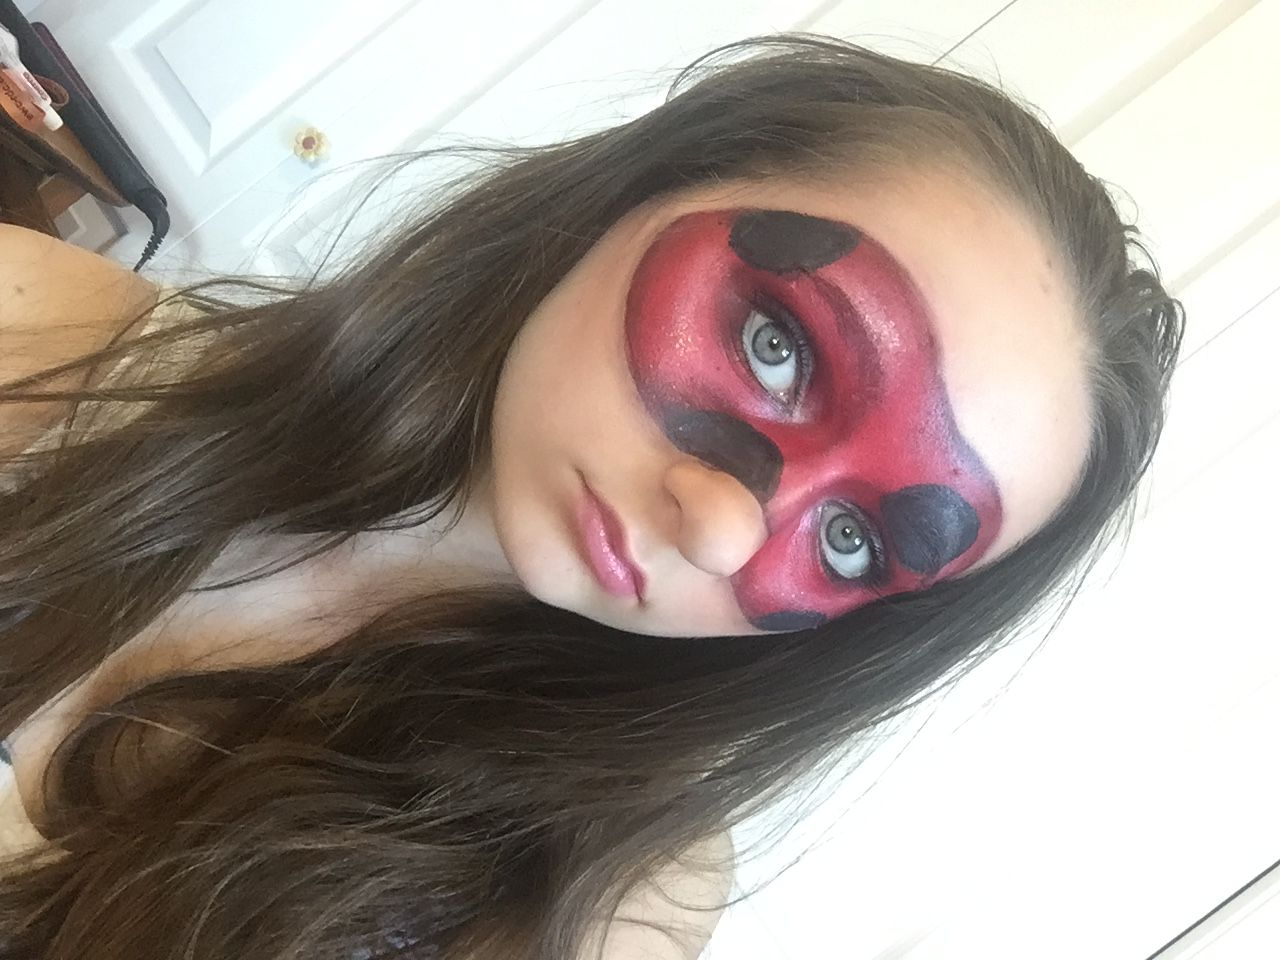 Ladybug Mask Made With Makeup Inspiracao De Maquiagem Maquiagem